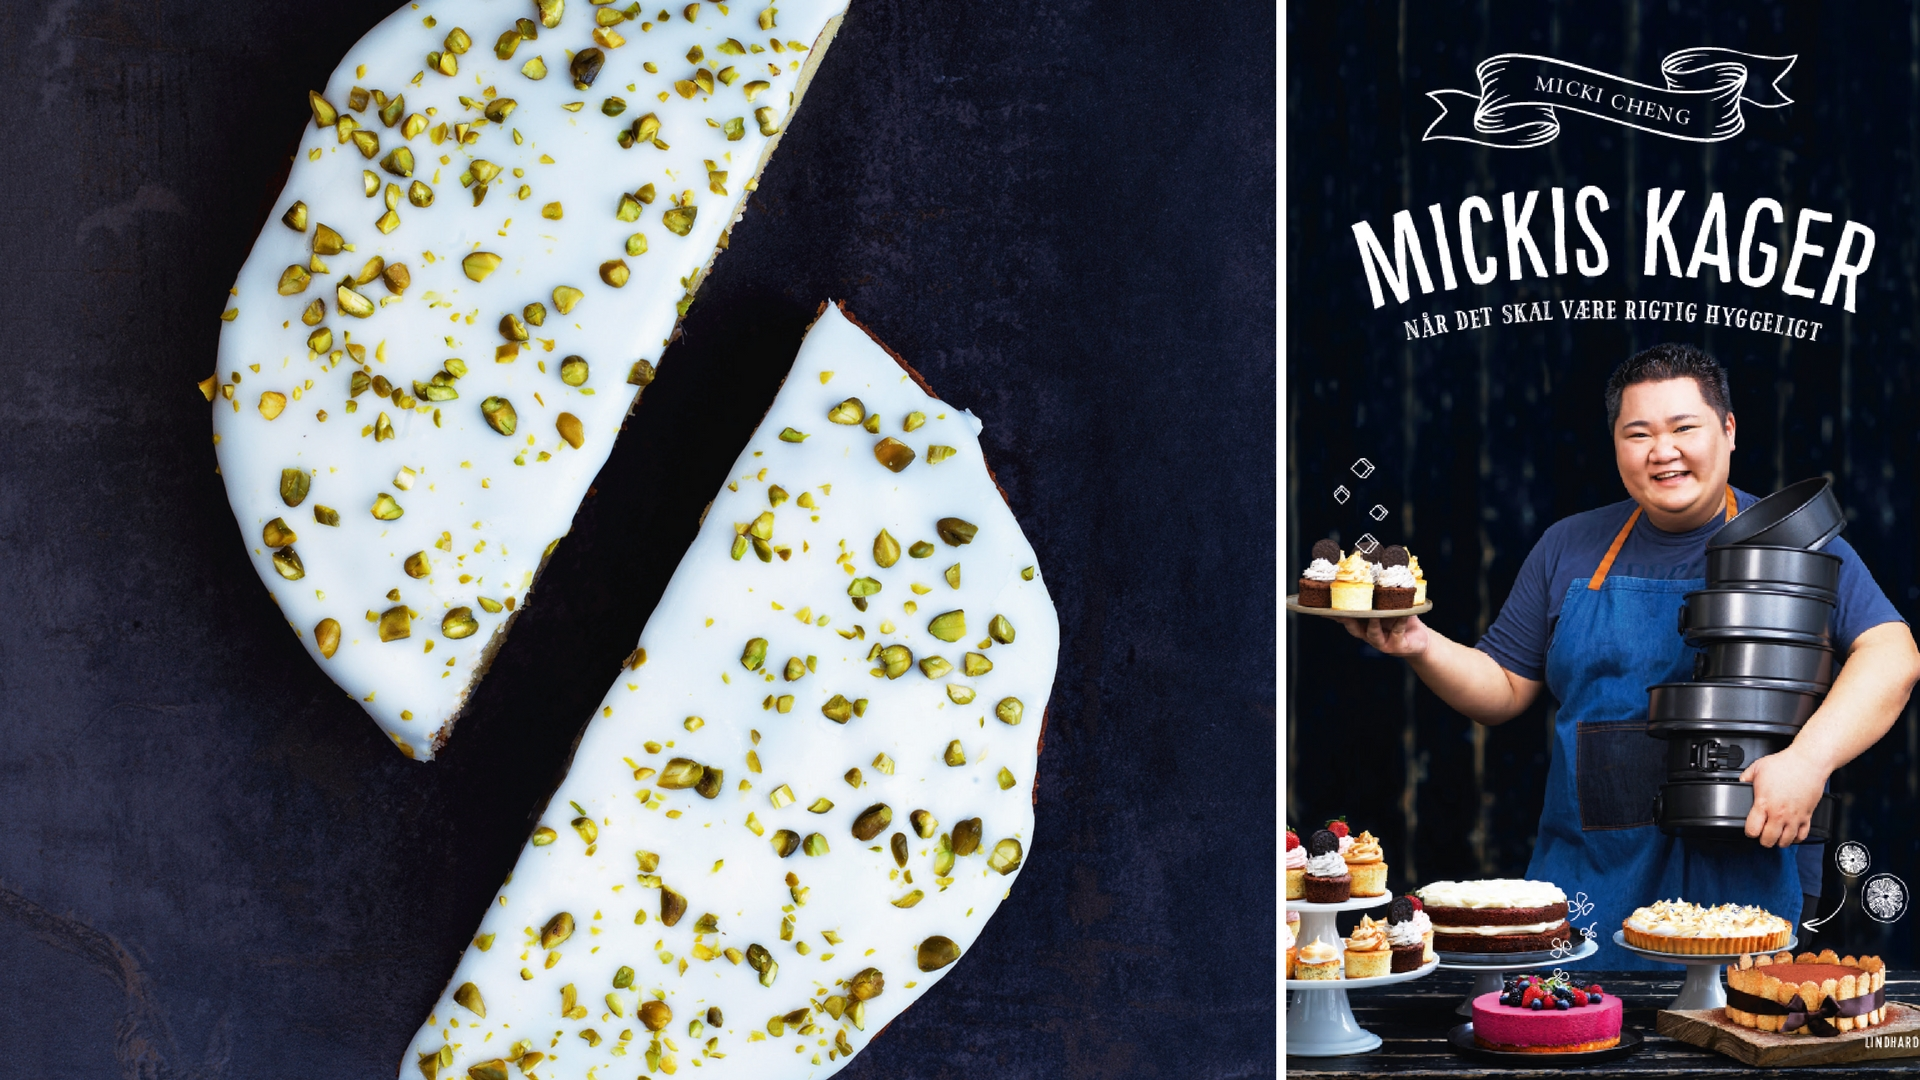 citronmåne opskrift kage mickis kager micki cheng